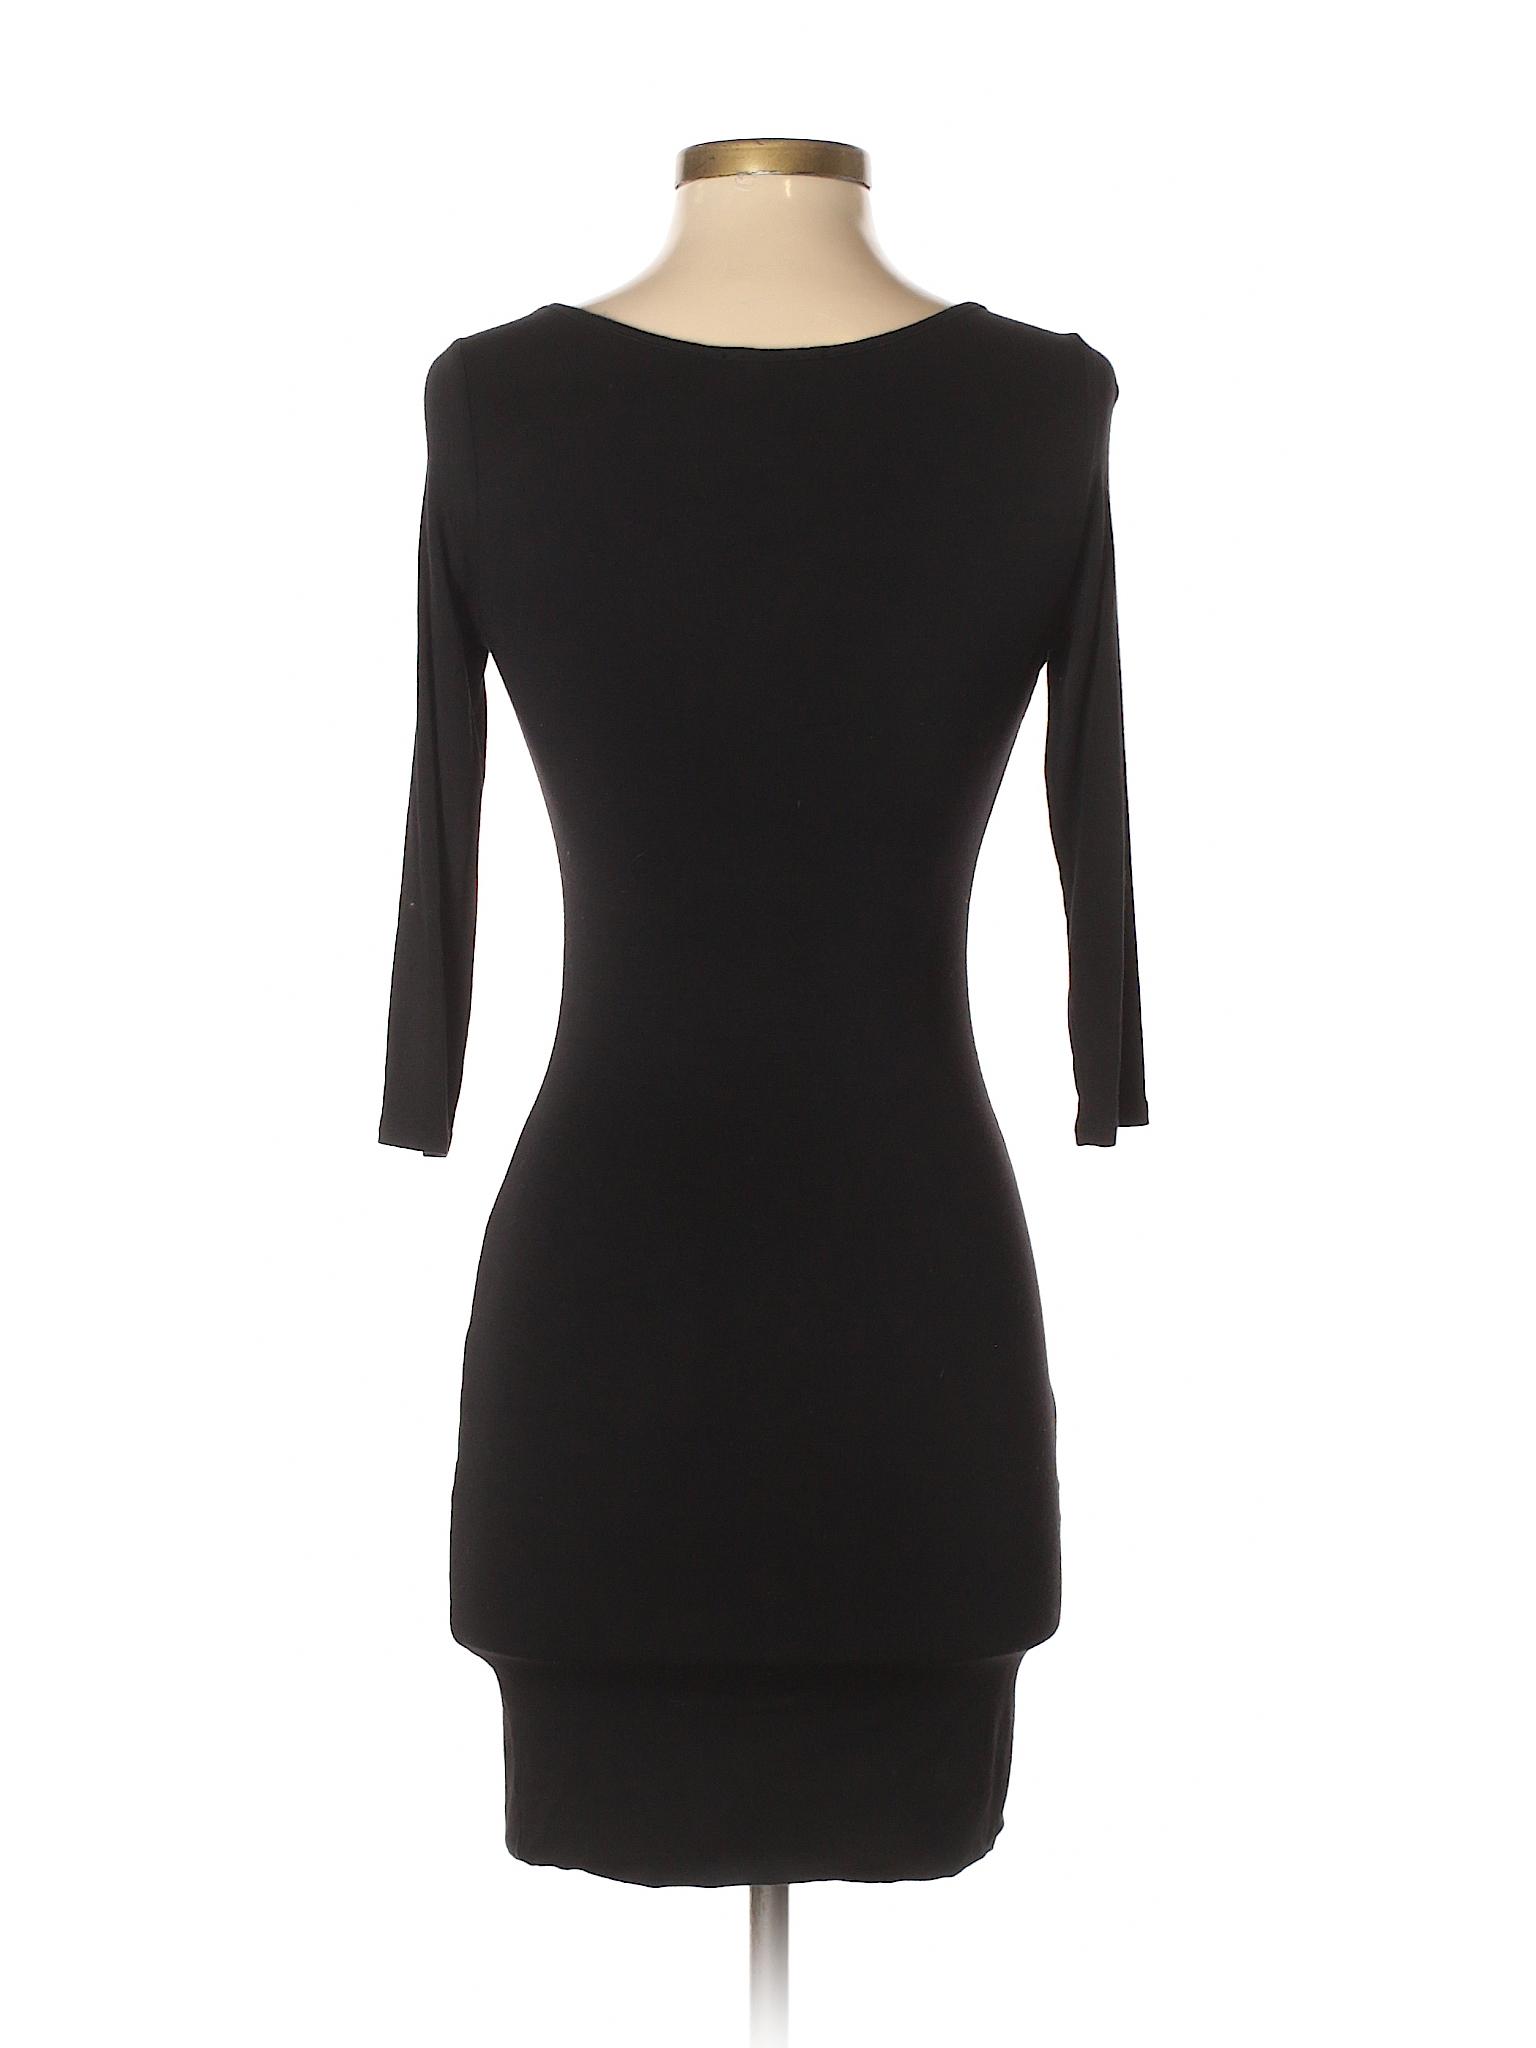 winter Dress Boutique Soprano Boutique winter Casual xw6n0xdX